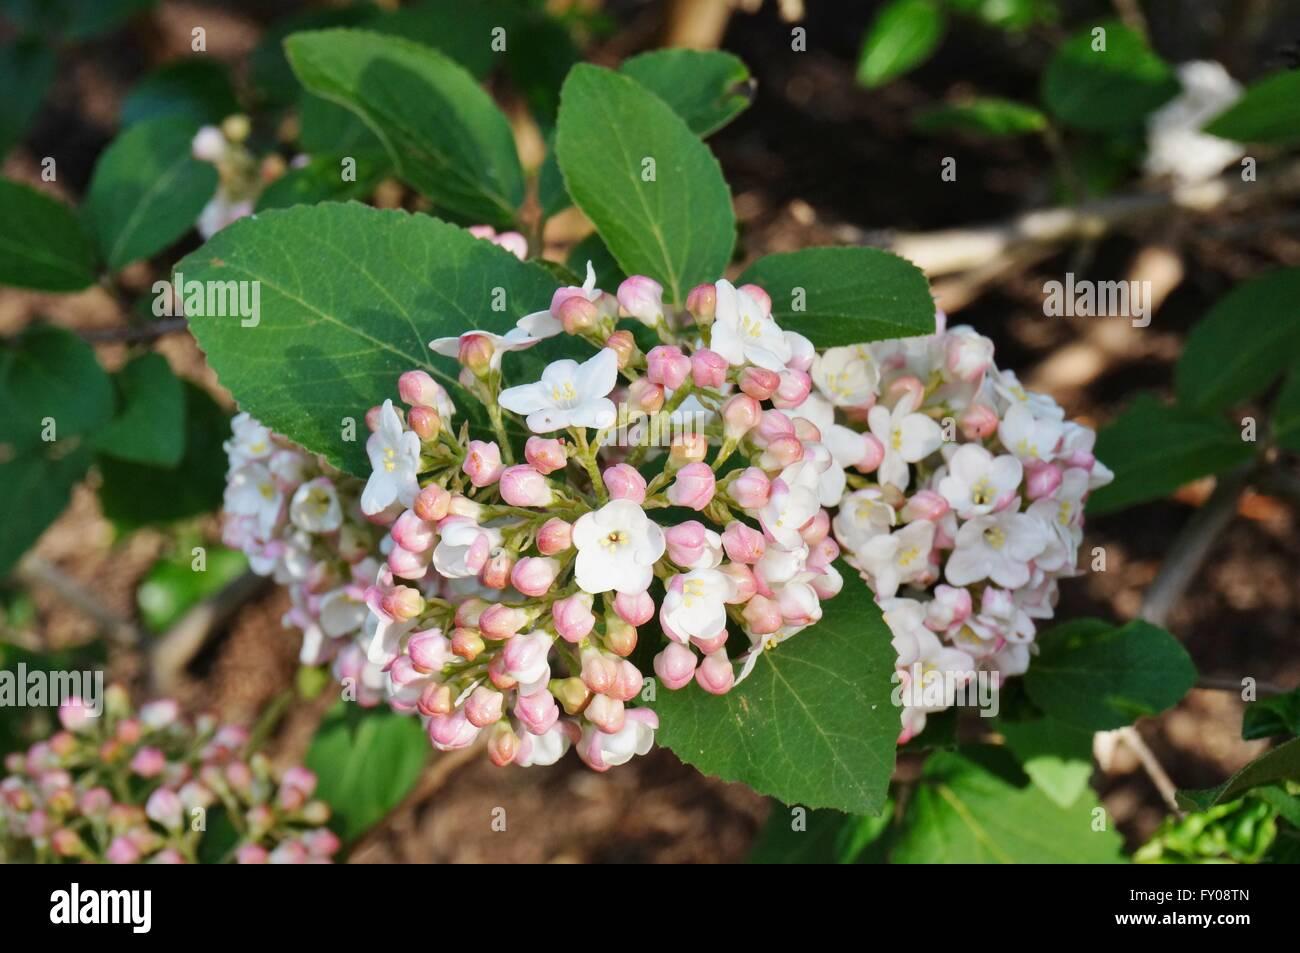 Viburnum flower stock photos viburnum flower stock images alamy white and pink flower balls of fragrant viburnum in bloom stock image mightylinksfo